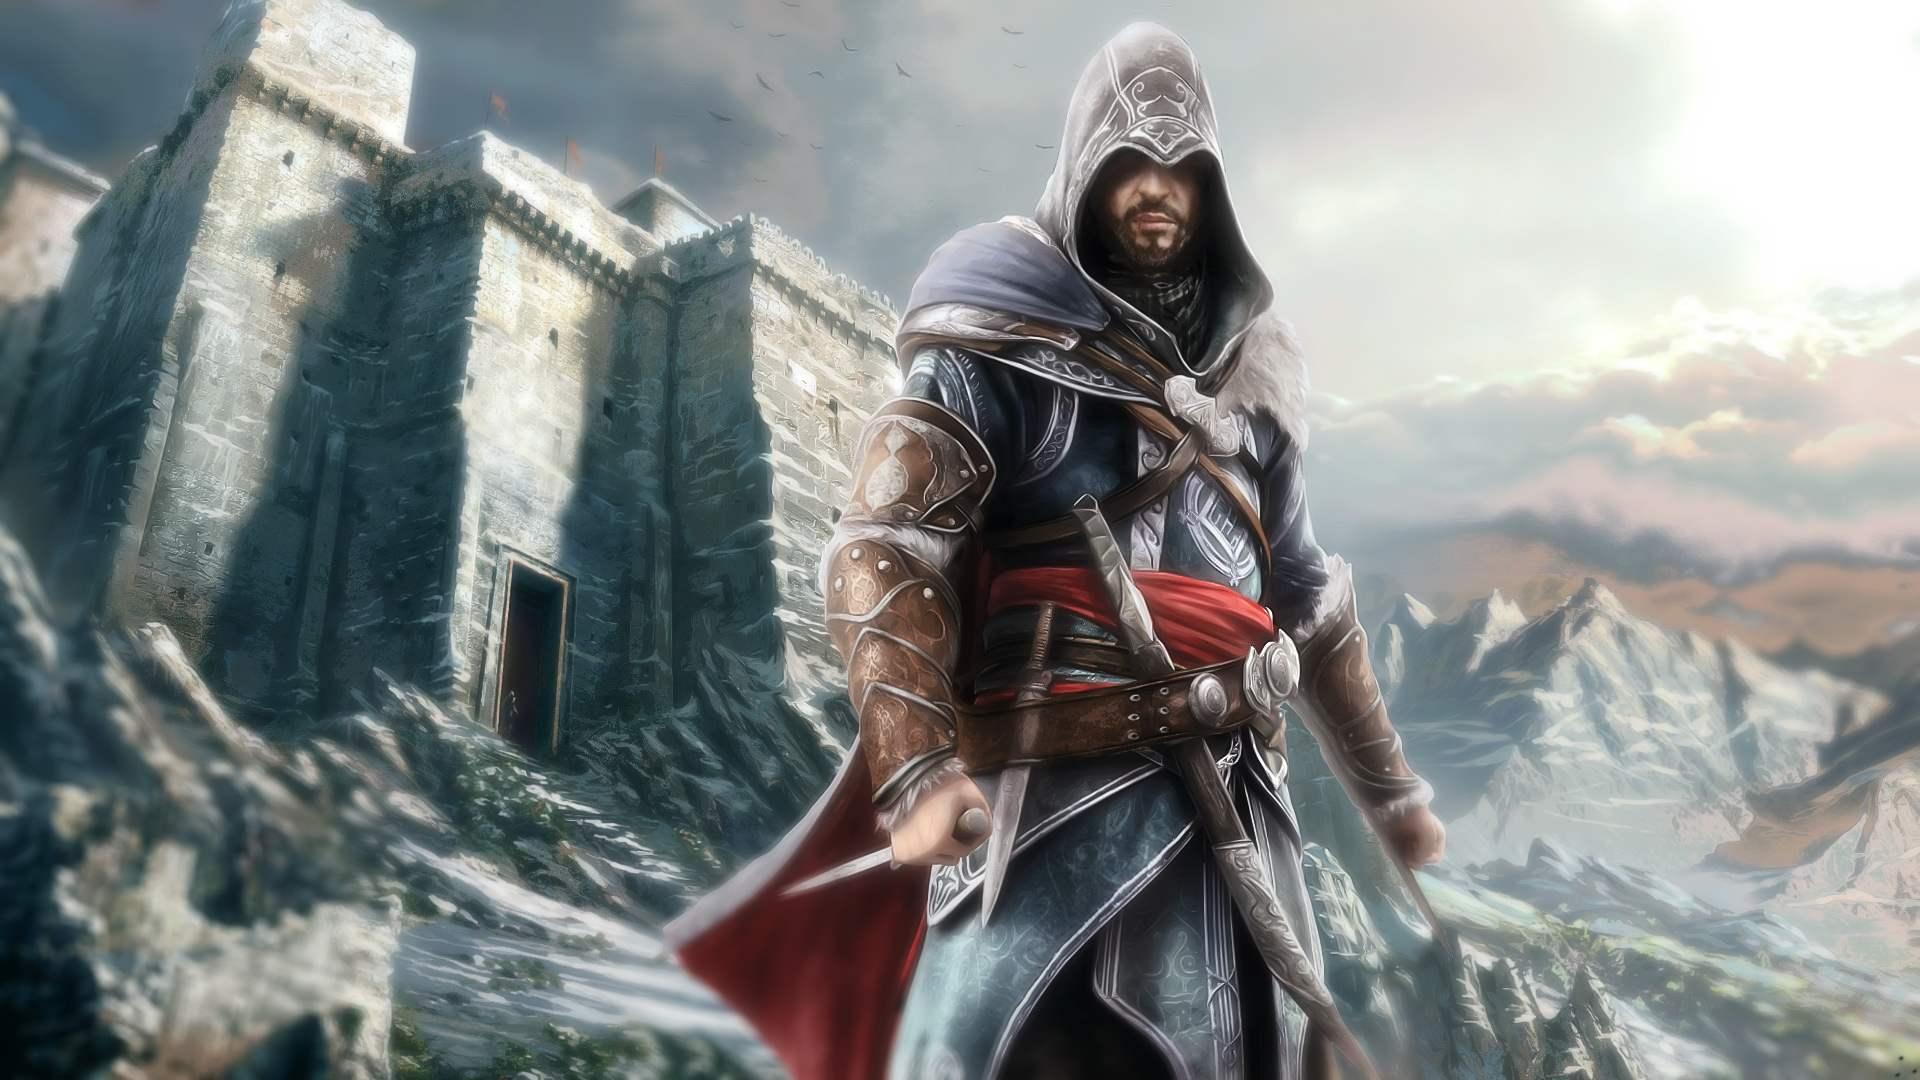 assassins creed 5 wallpaper - photo #8